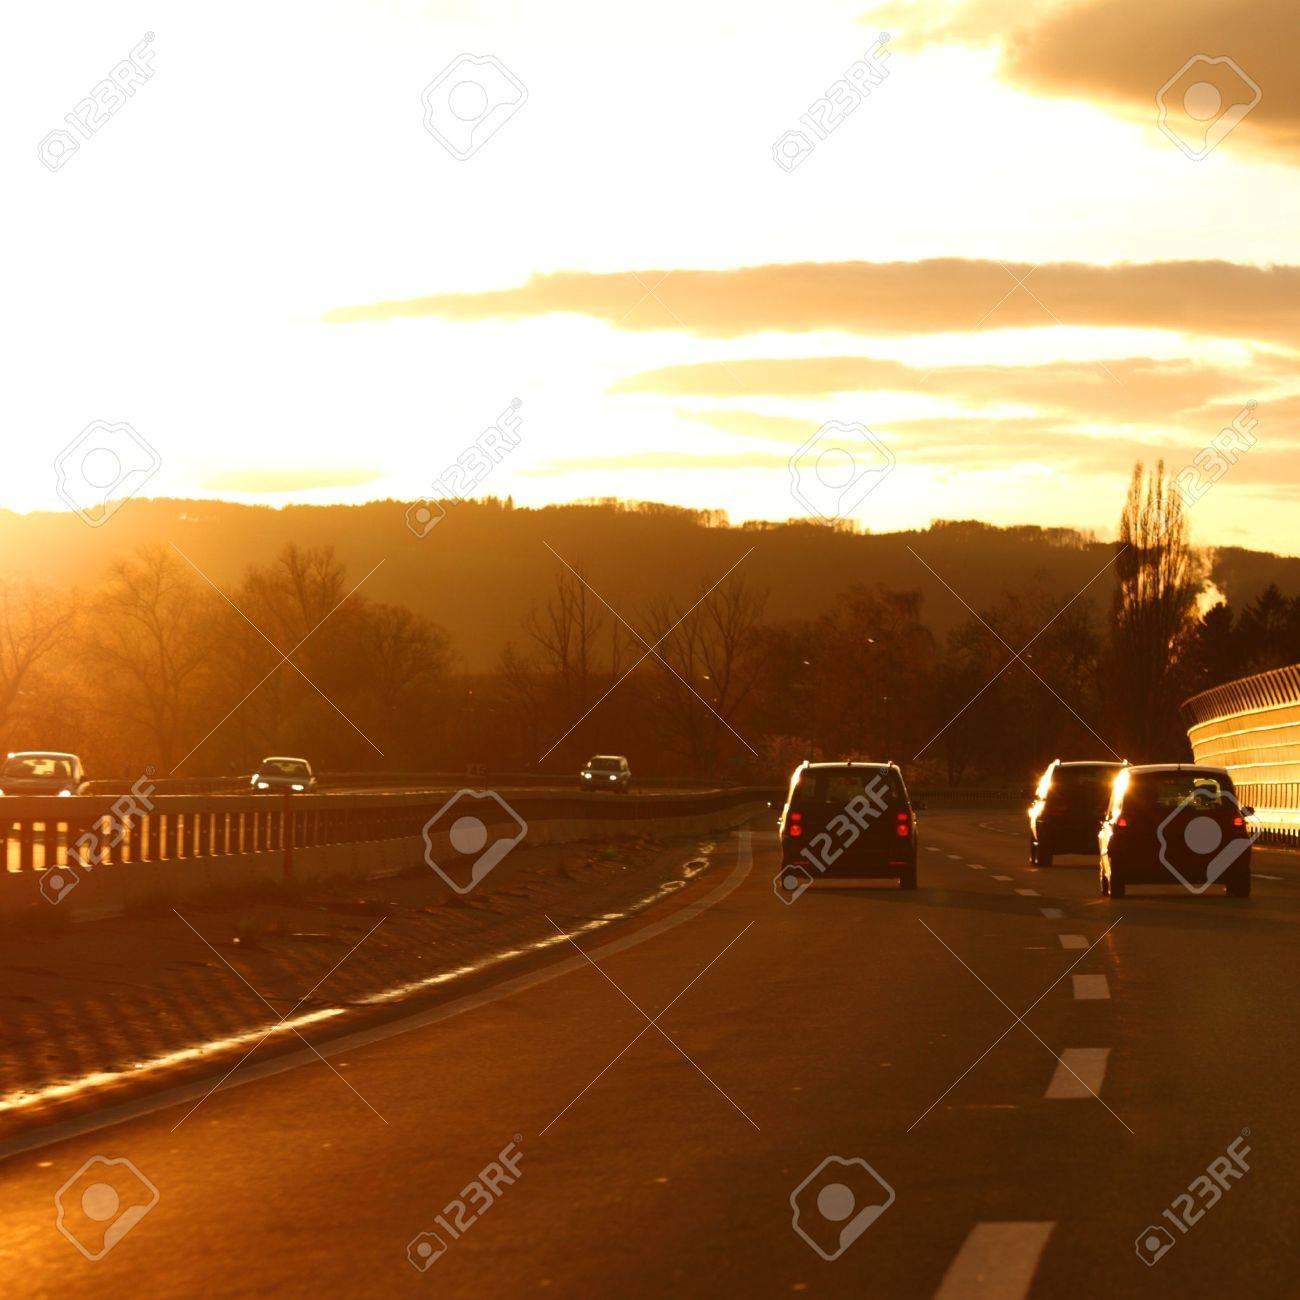 sunrise drive on car Stock Photo - 8744302